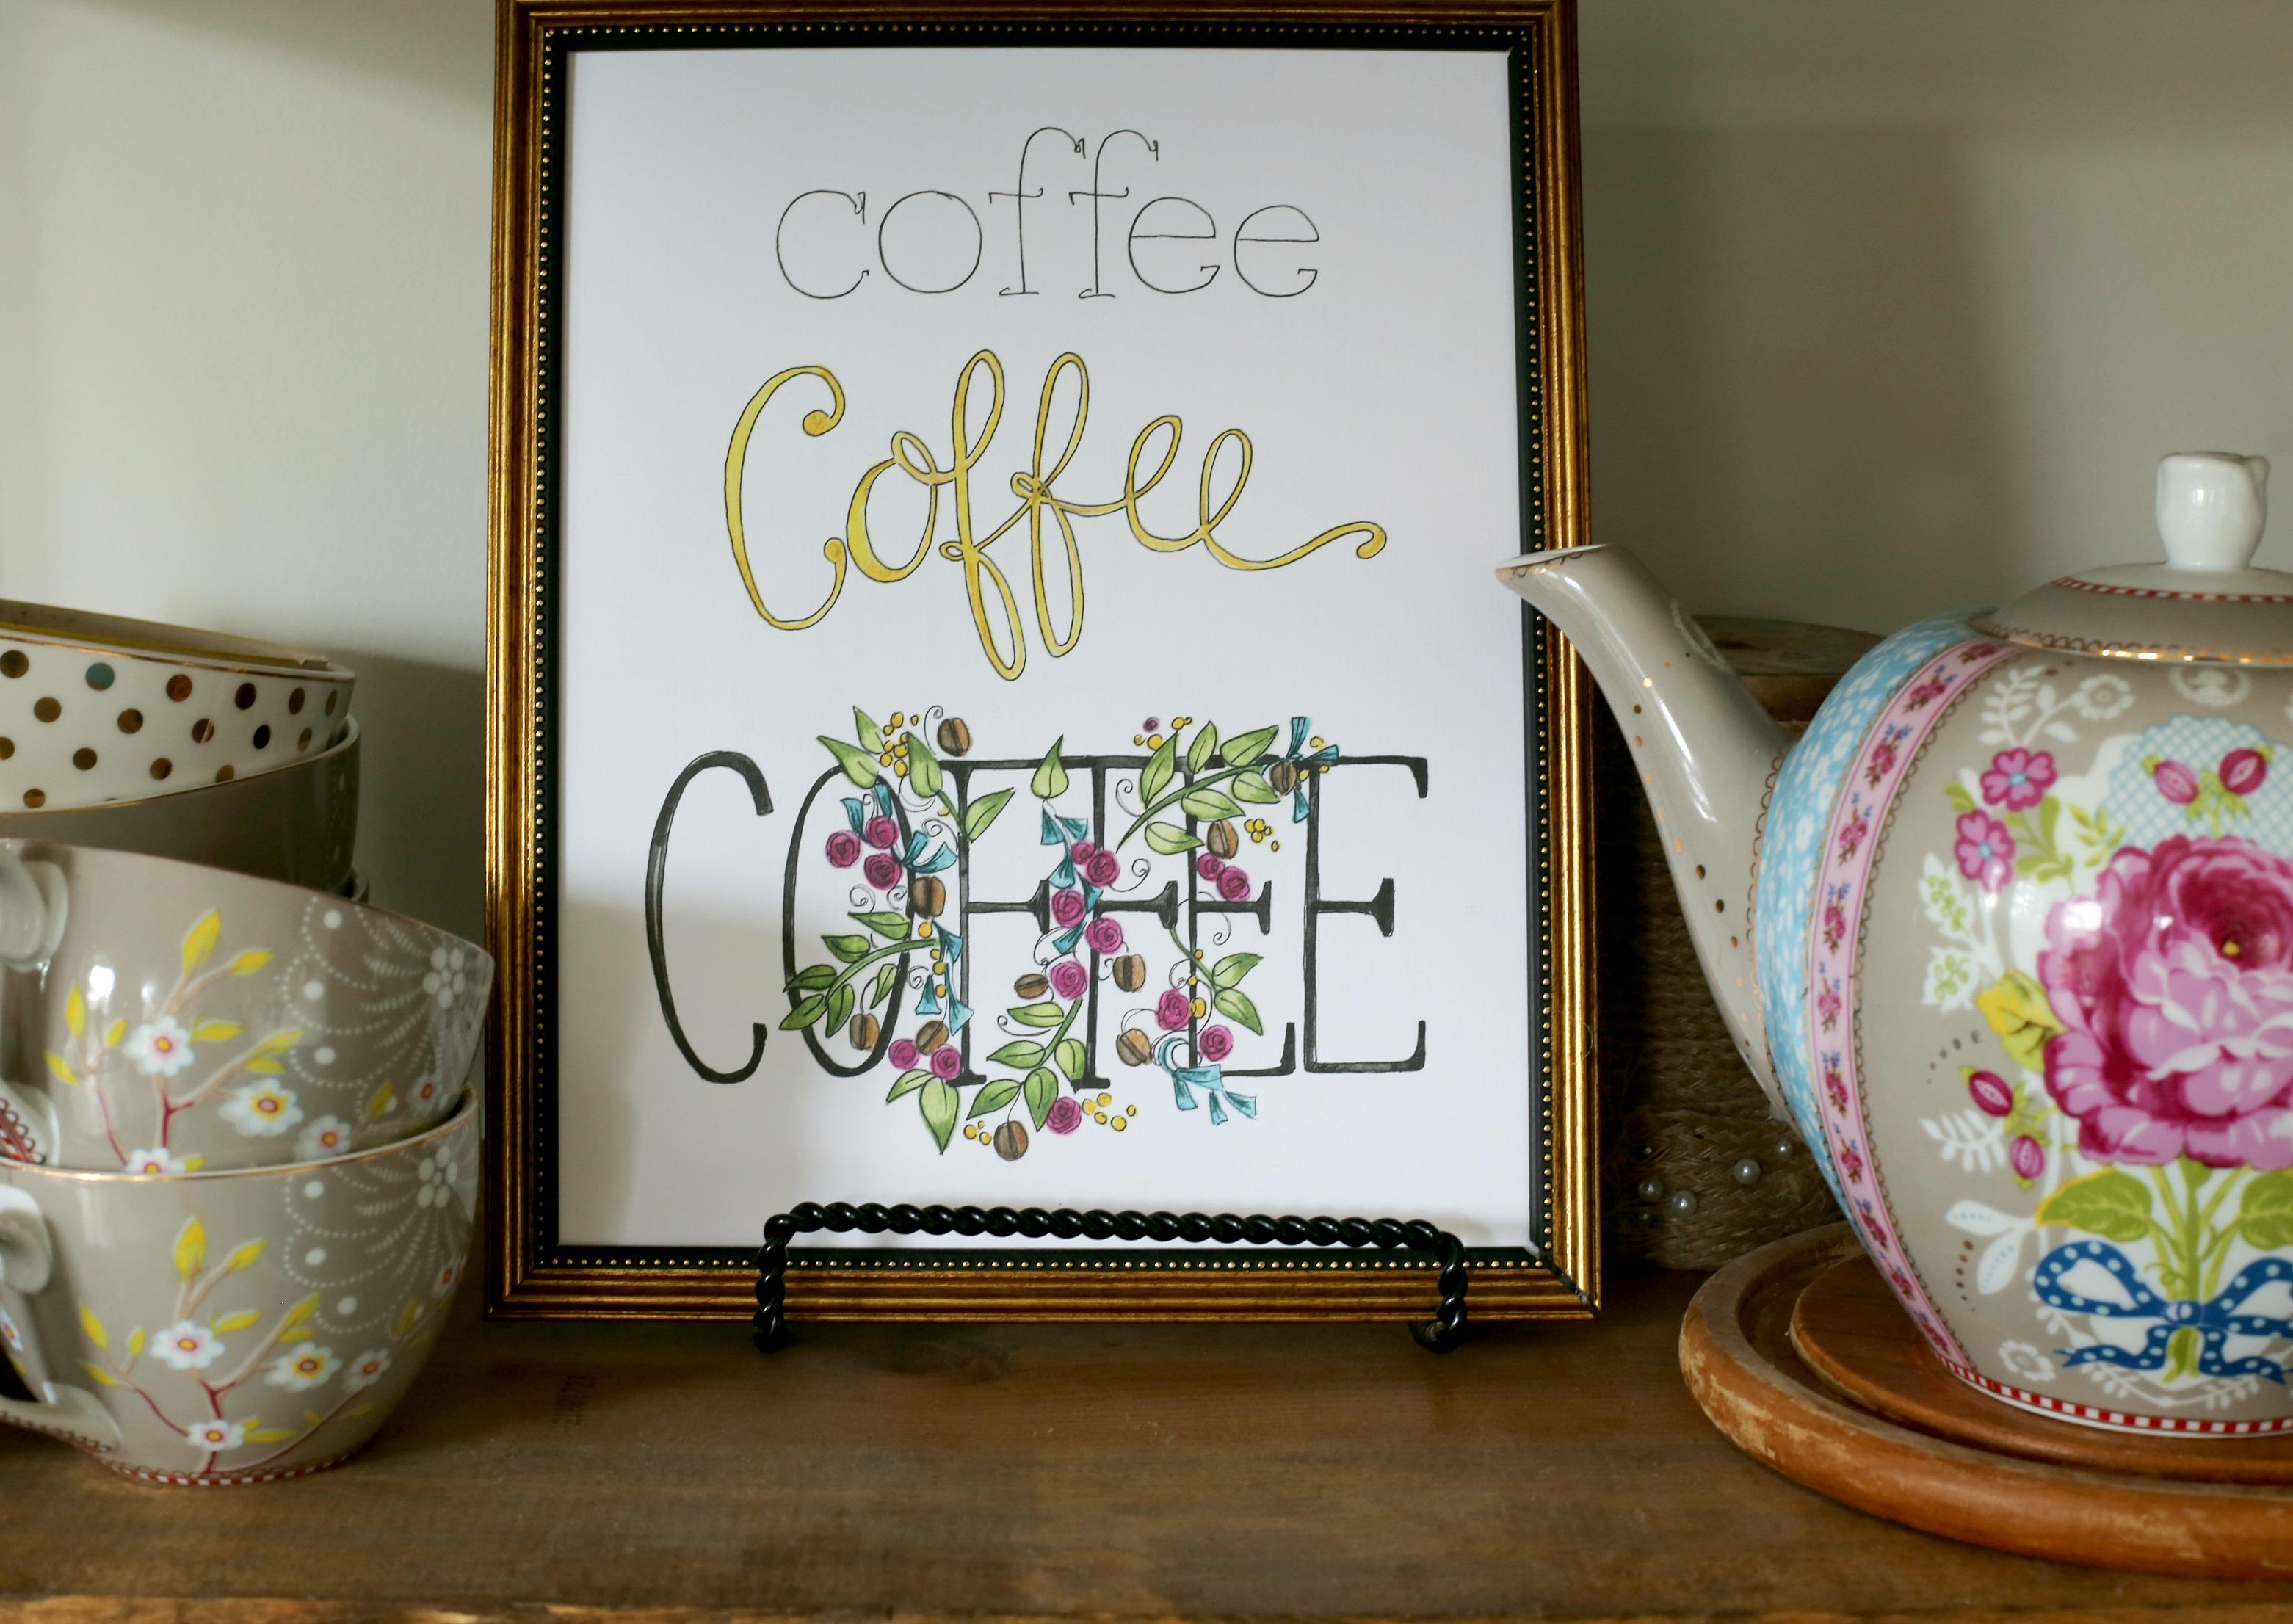 coffeecoffeecofee